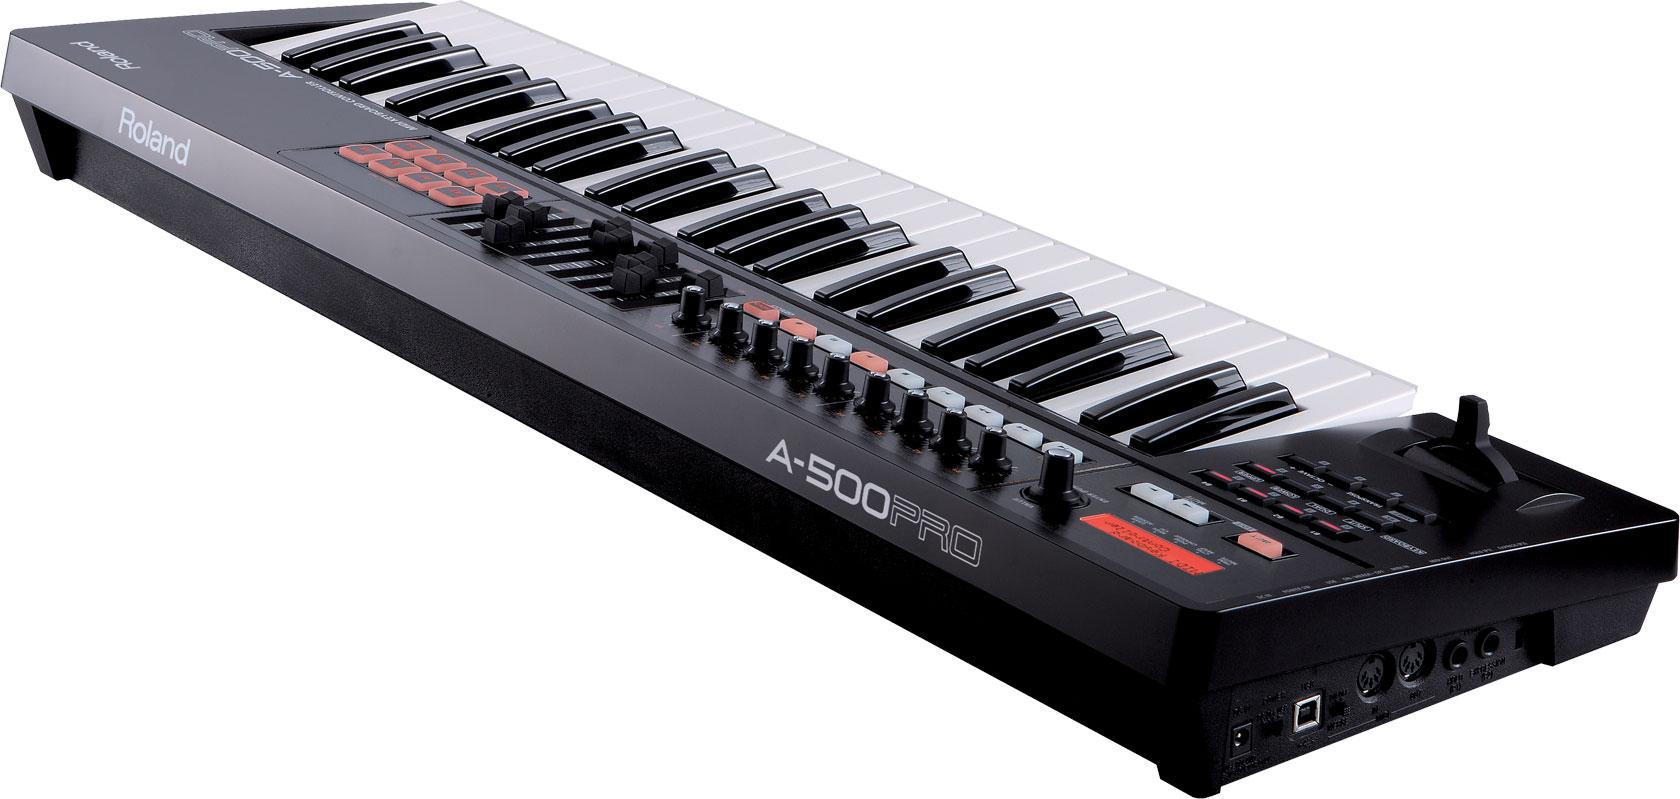 roland a 500pro midi keyboard controller. Black Bedroom Furniture Sets. Home Design Ideas